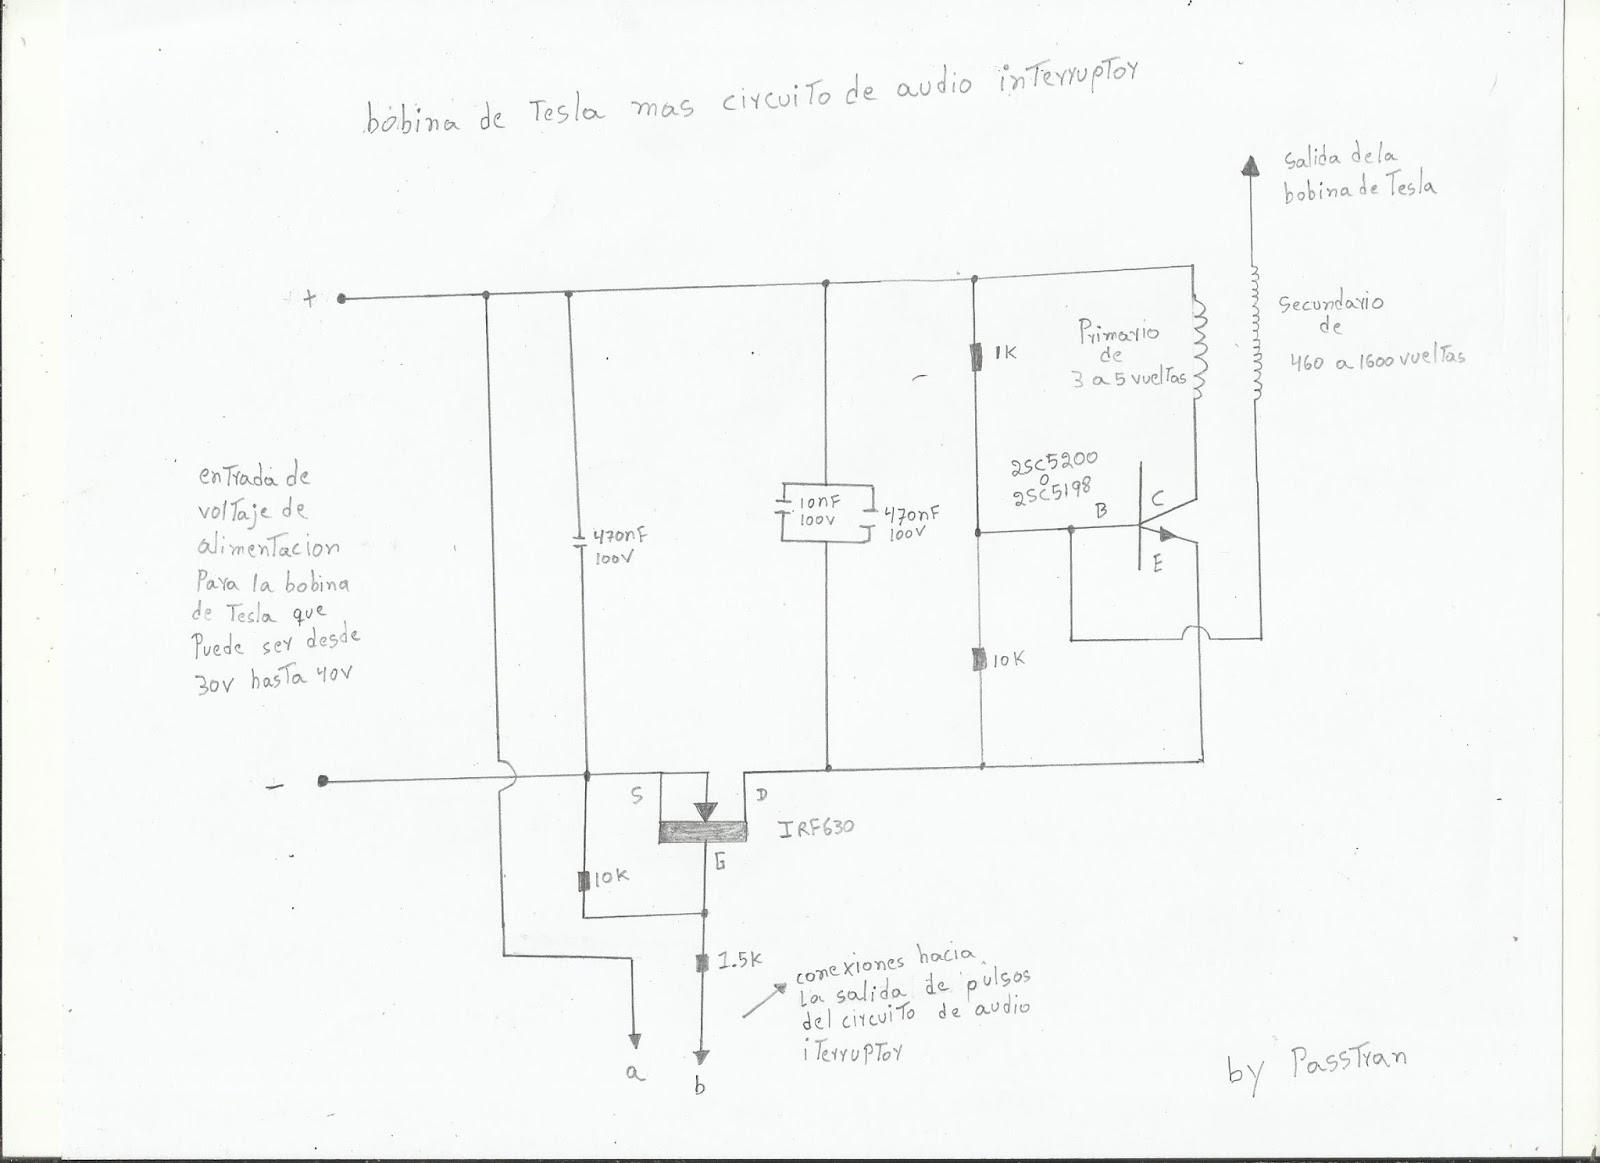 Circuito Bobina De Tesla : Ponyelectronica prototipo de audio interruptor para mini bobina